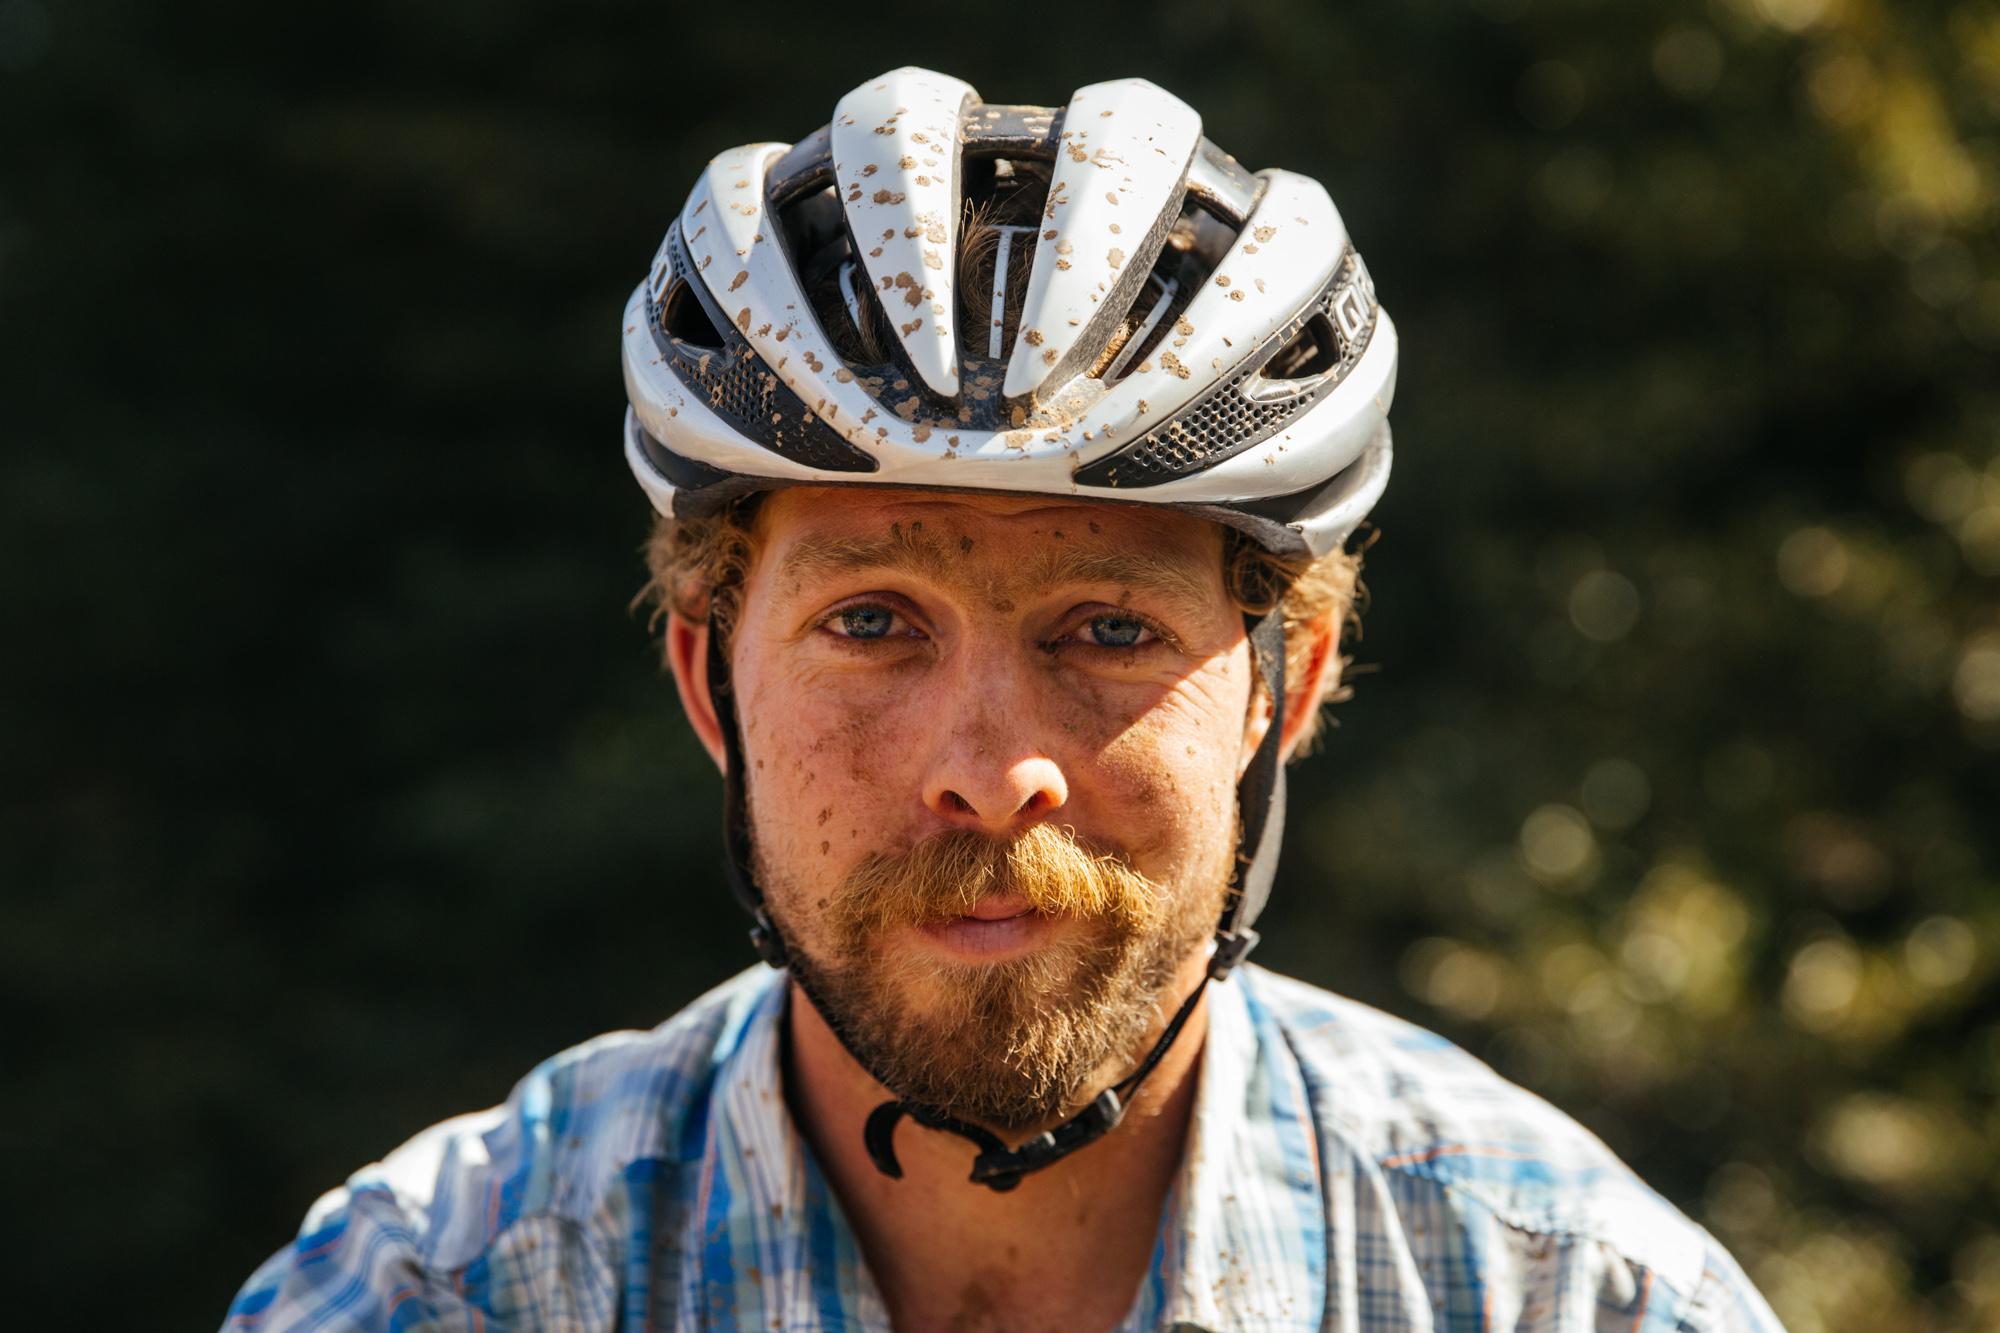 Racer Portraits